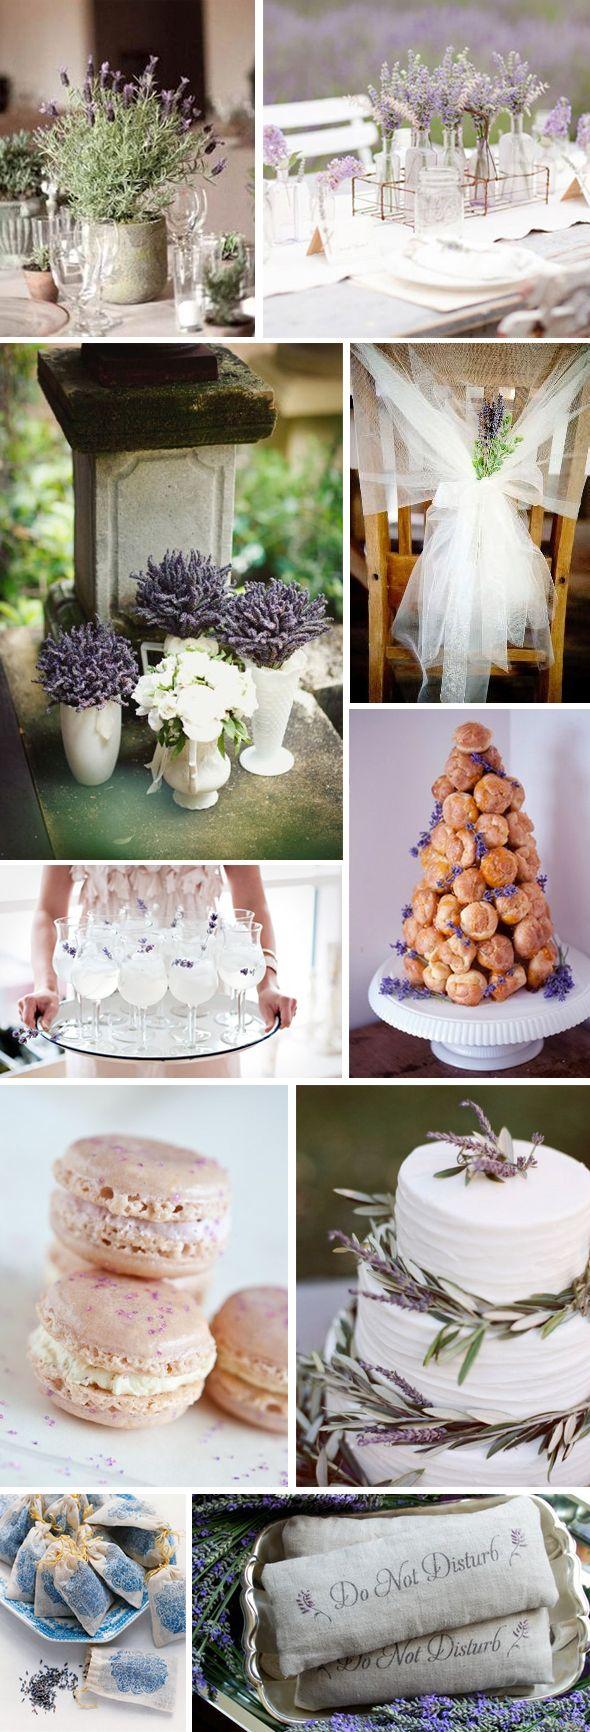 Lavender decor for wedding rustic lavender  In do time  Pinterest  Lavender weddings